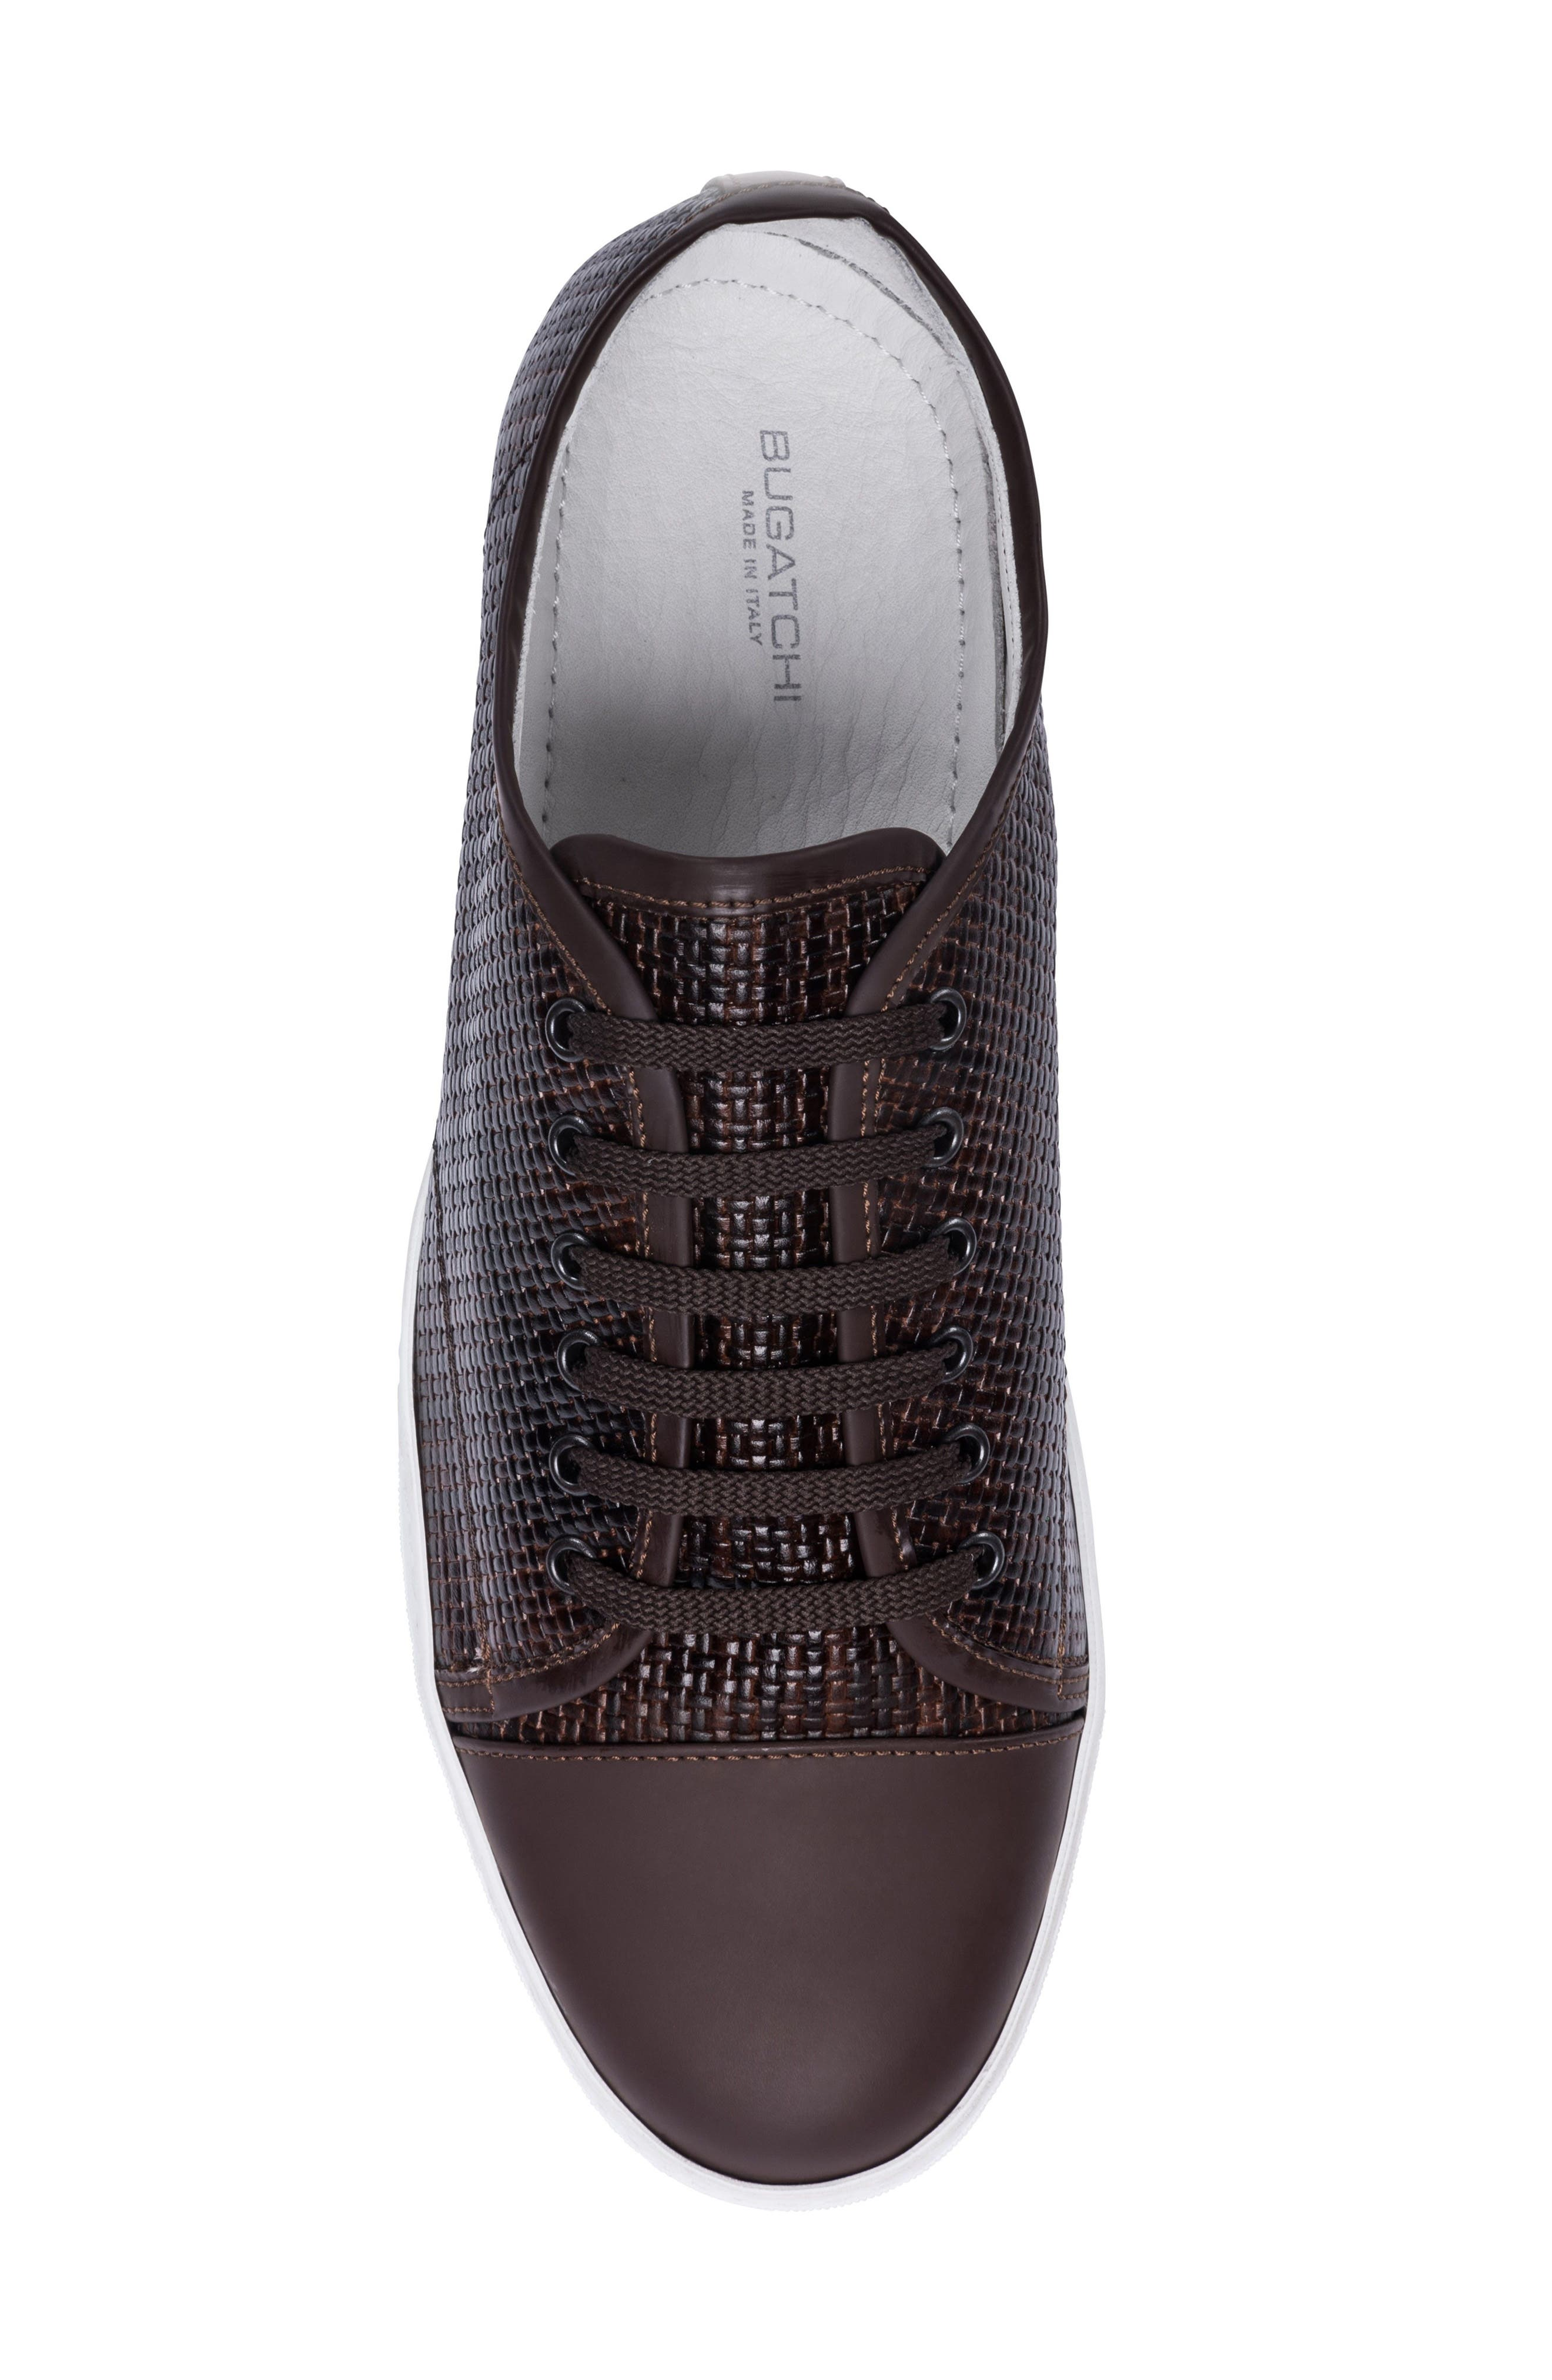 Cinque Terre Woven Cap Toe Sneaker,                             Alternate thumbnail 5, color,                             Brown Leather